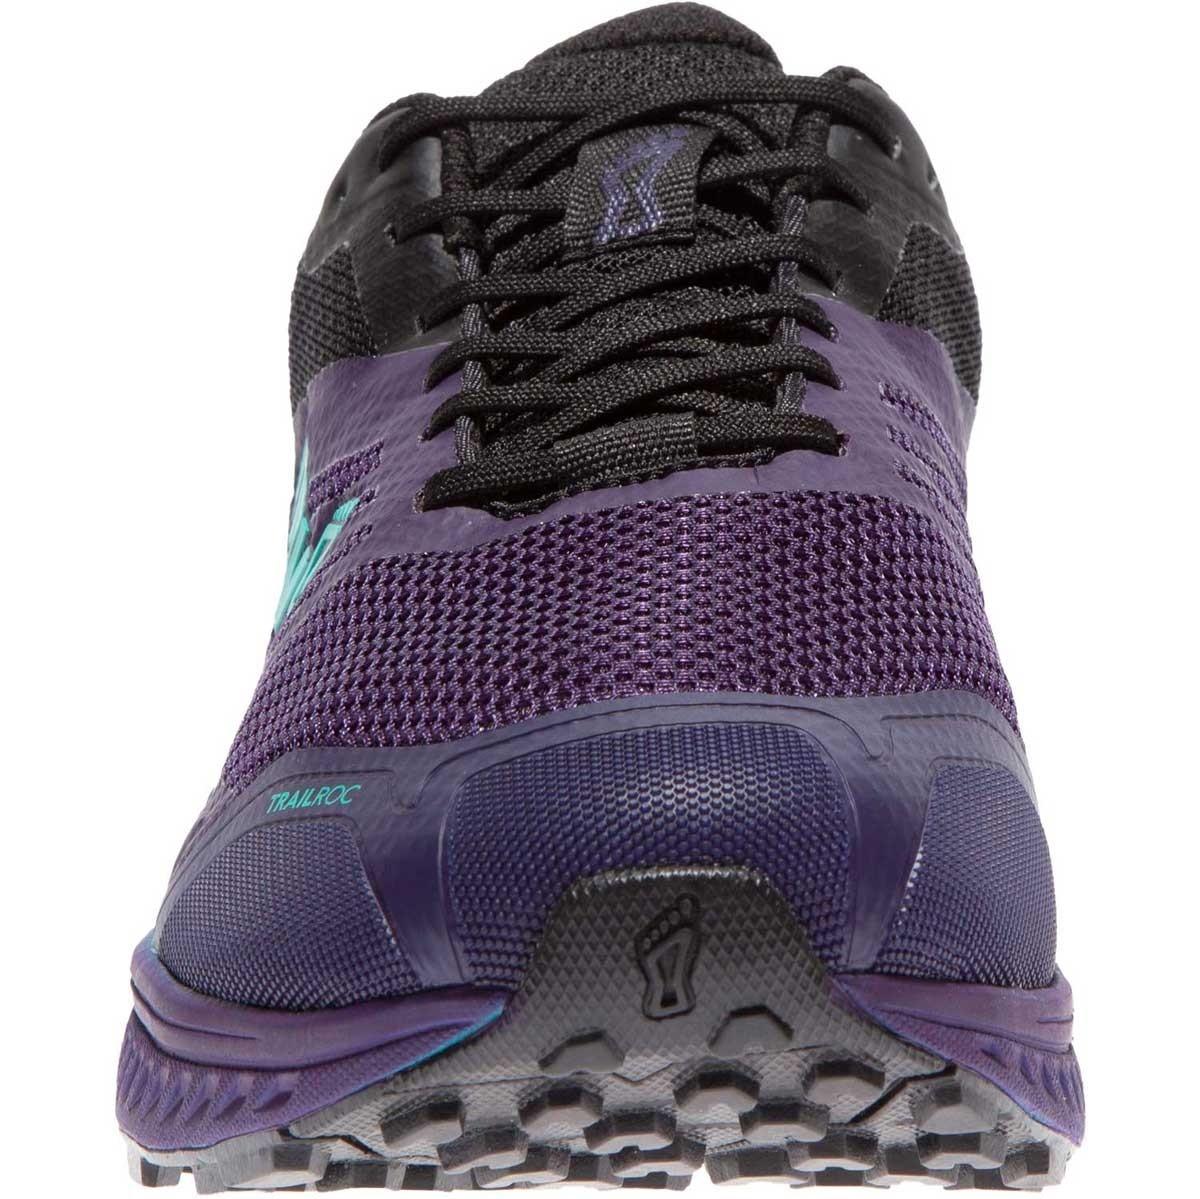 Inov-8 Trailroc G 280 Running Shoe - Women's - Purple/Black